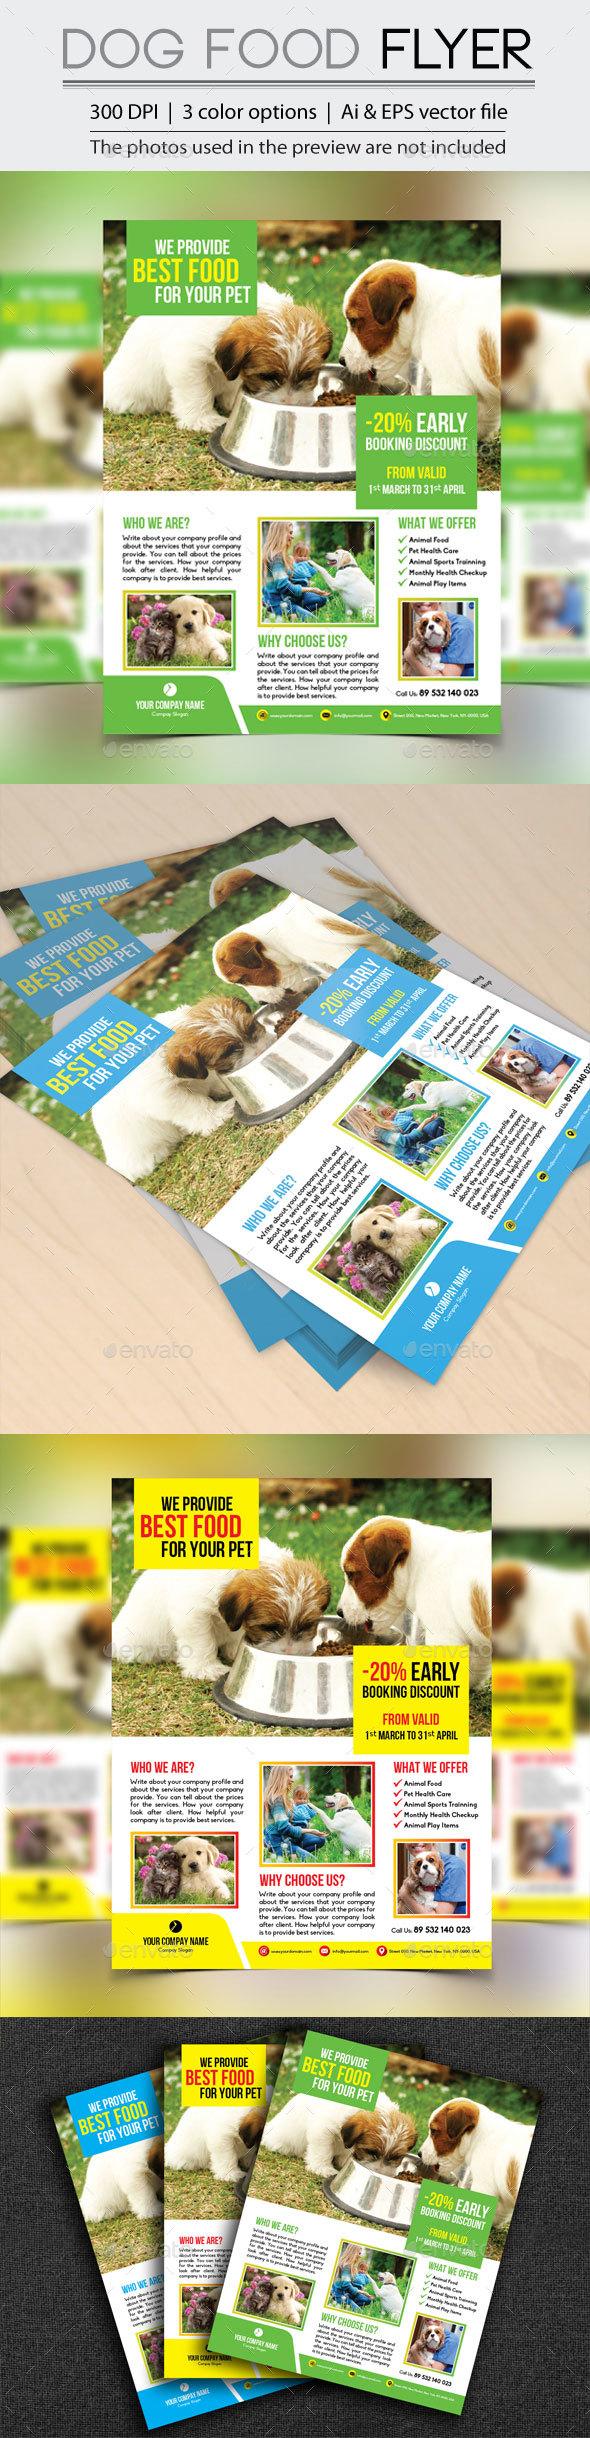 Dog Food Flyer